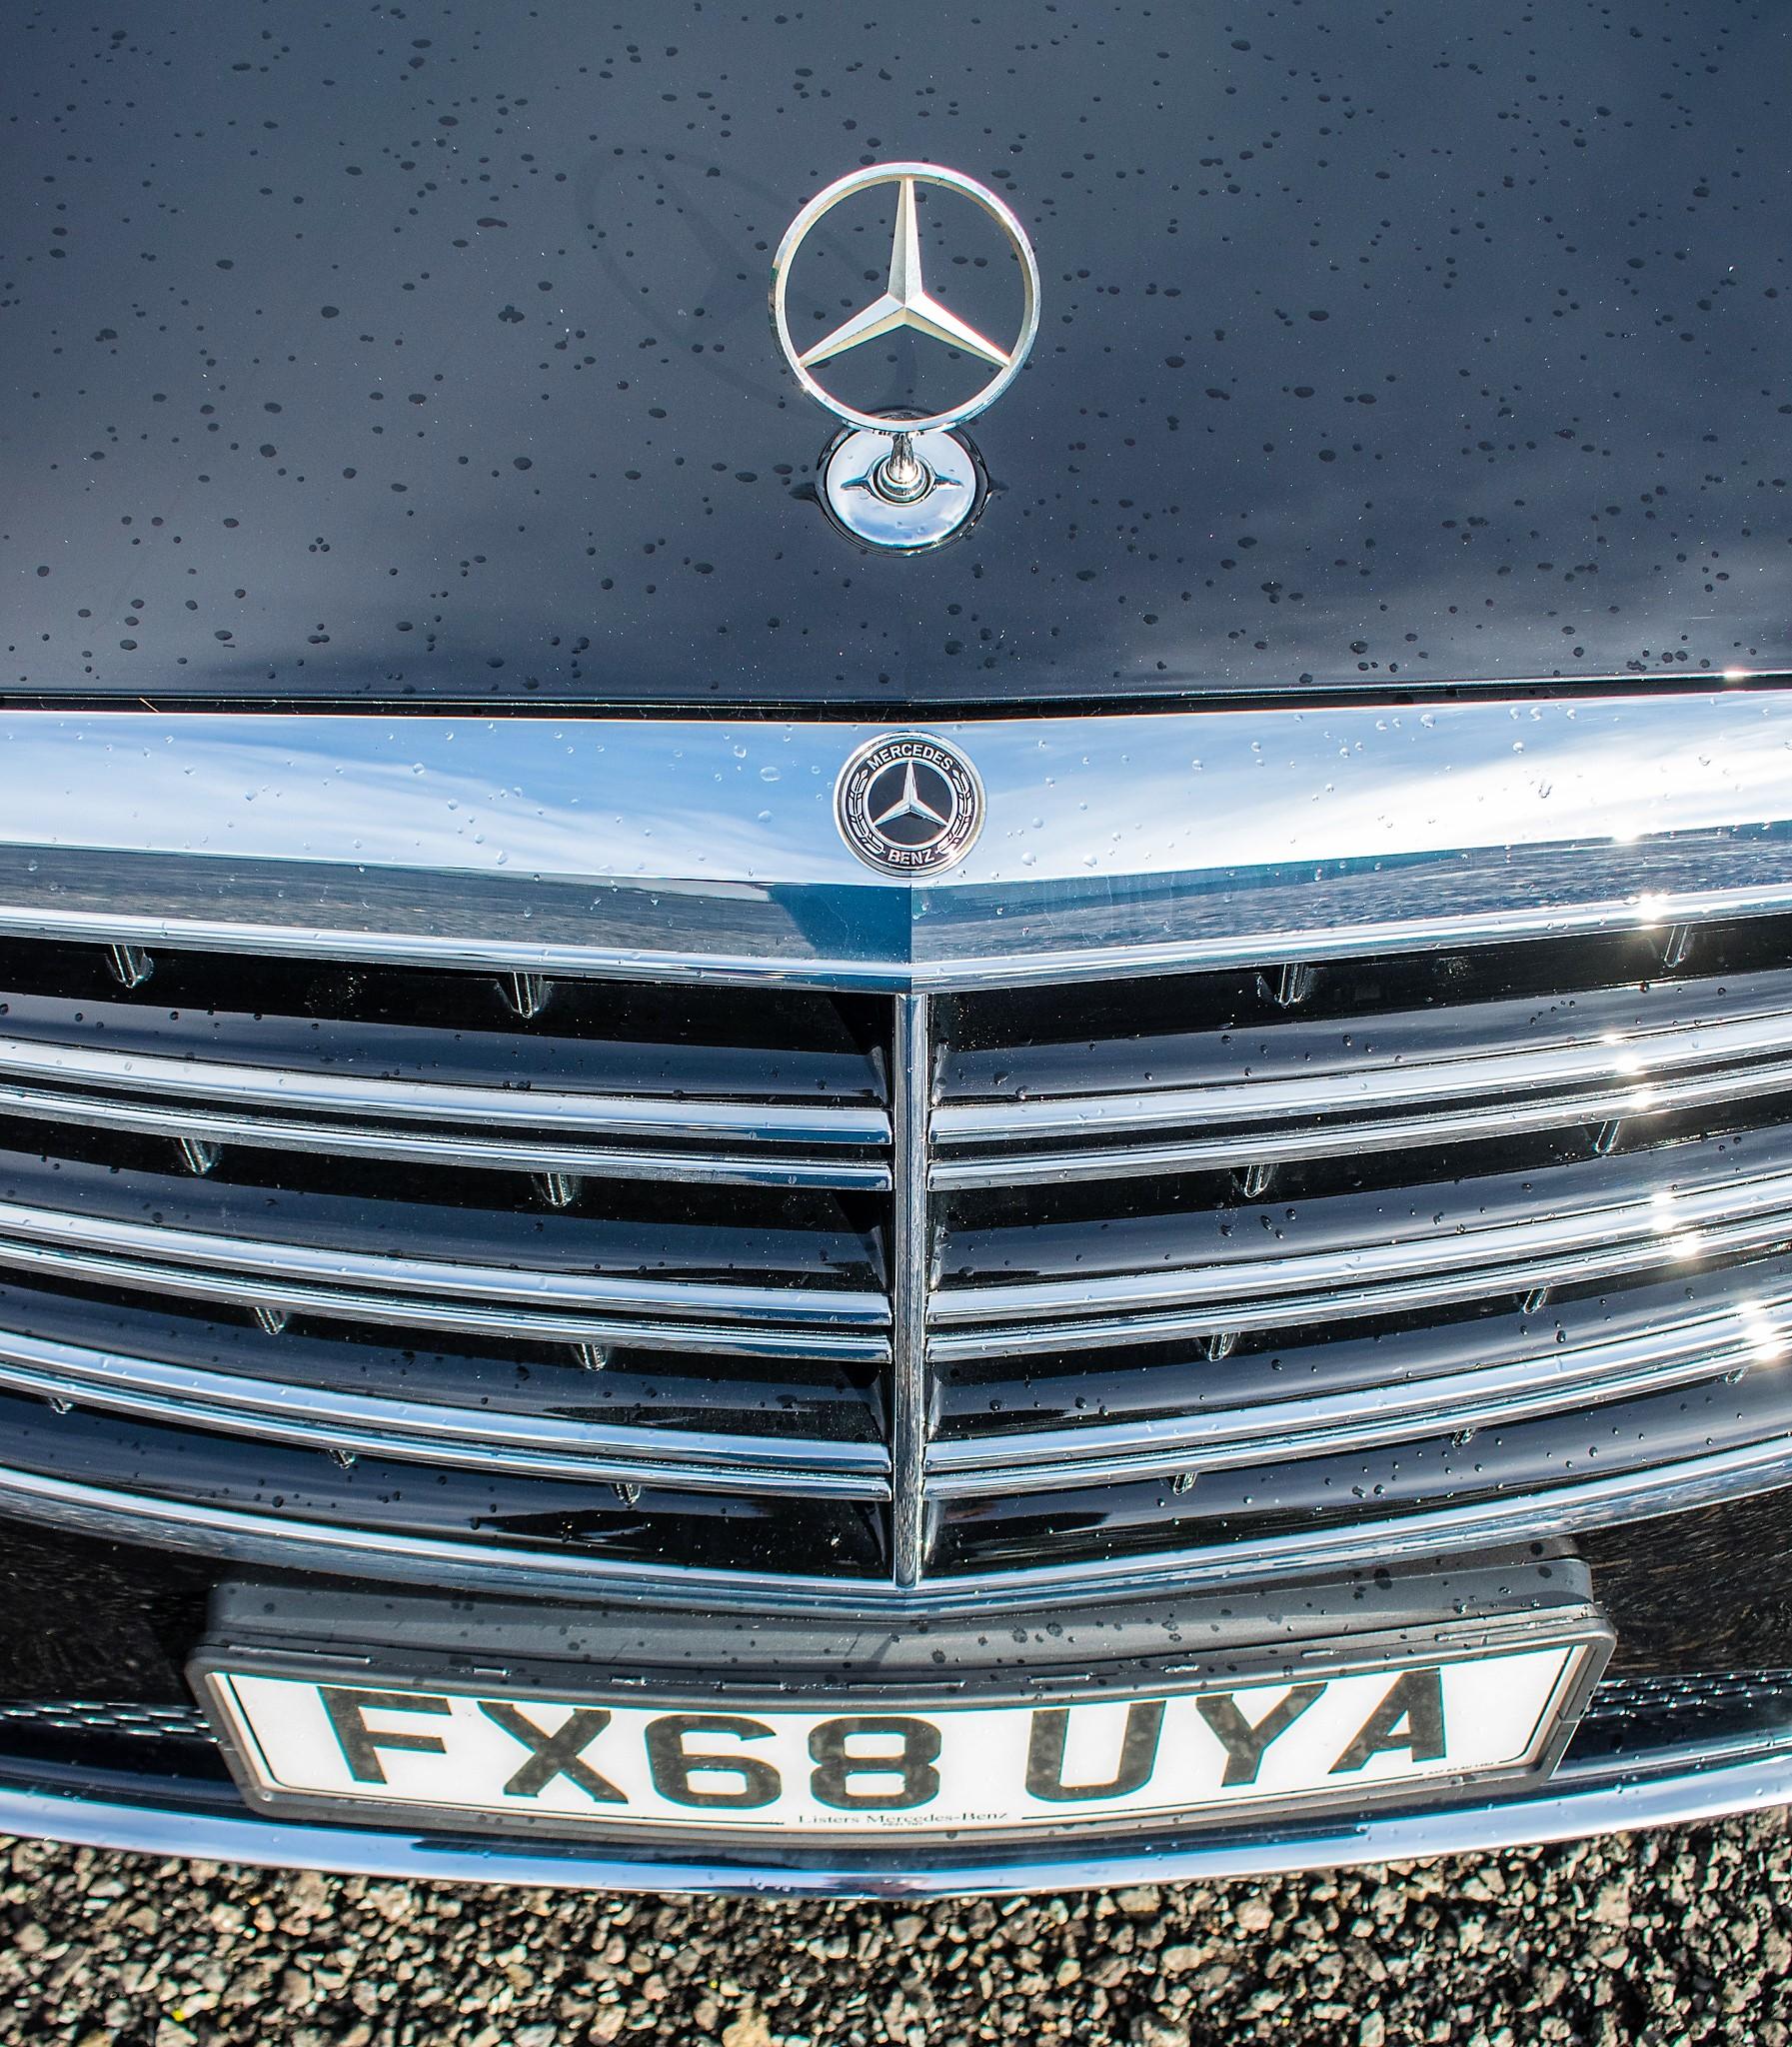 Mercedes Benz S450 L AMG Line Executive auto petrol 4 door saloon car Registration Number: FX68 - Image 8 of 30